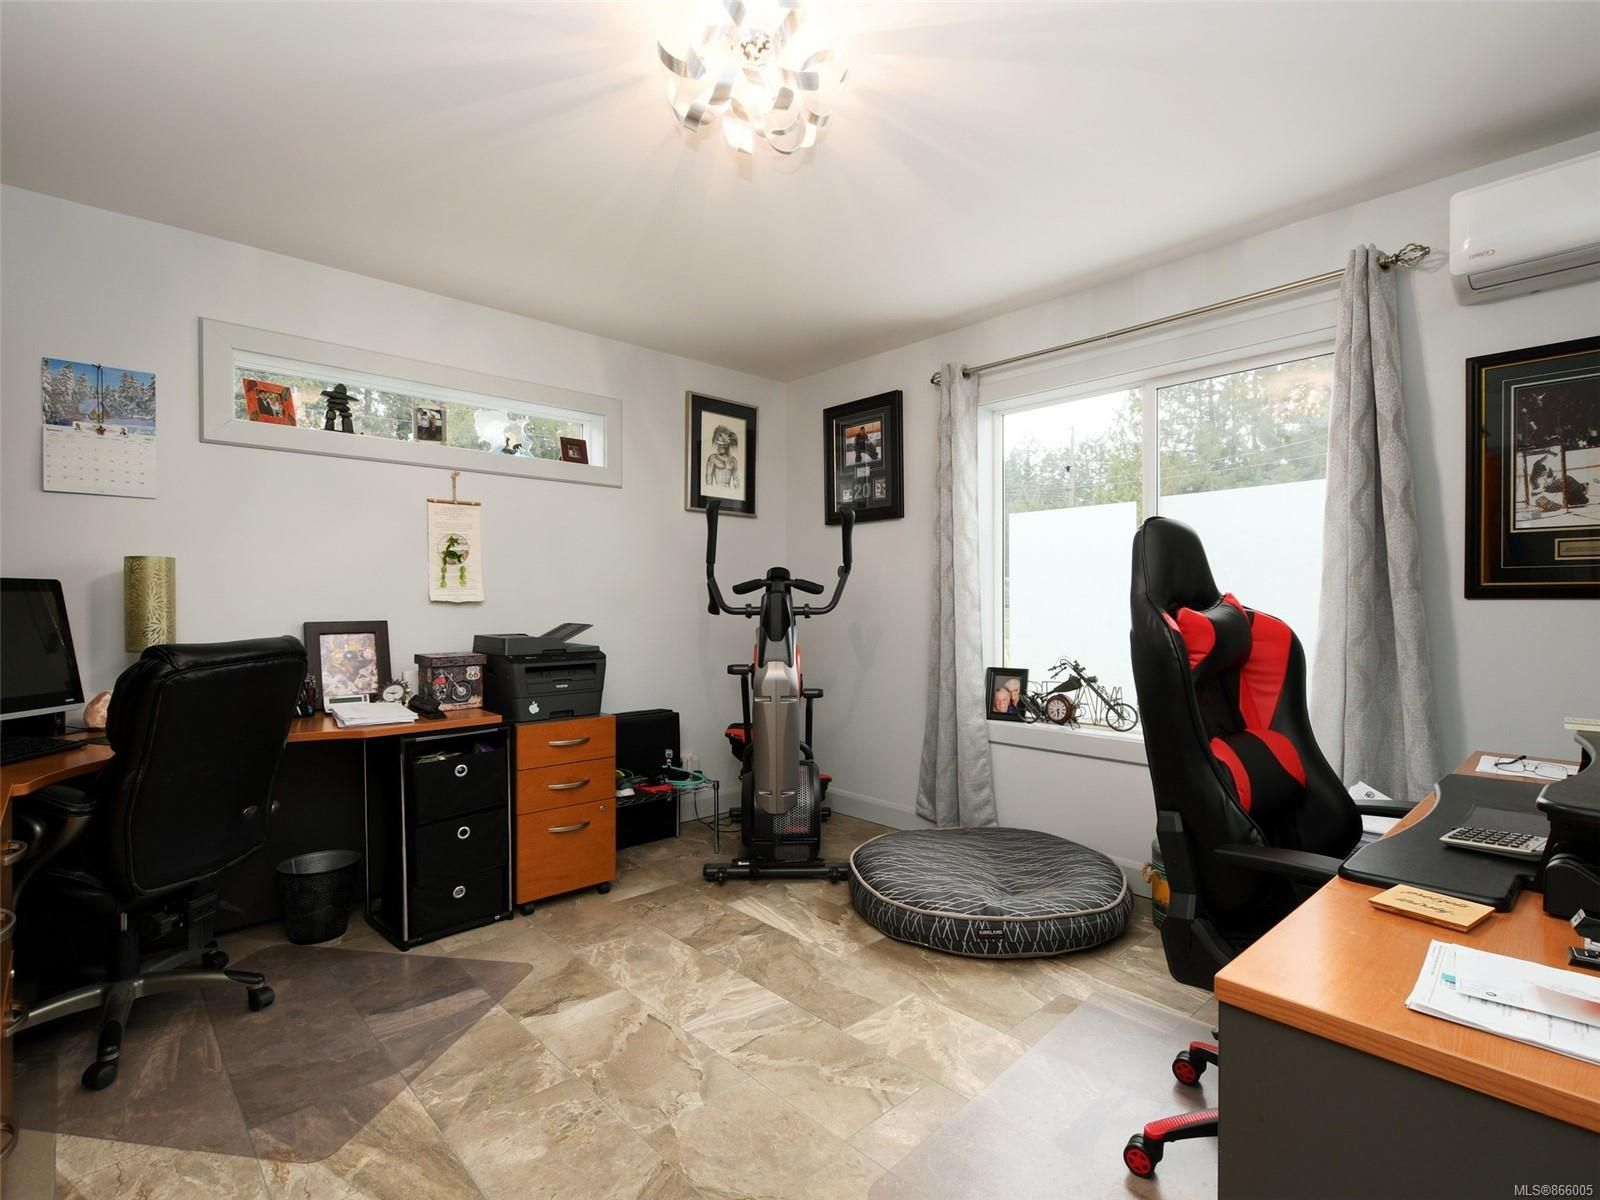 Photo 14: Photos: 5739 Siasong Rd in : Sk Saseenos House for sale (Sooke)  : MLS®# 866005